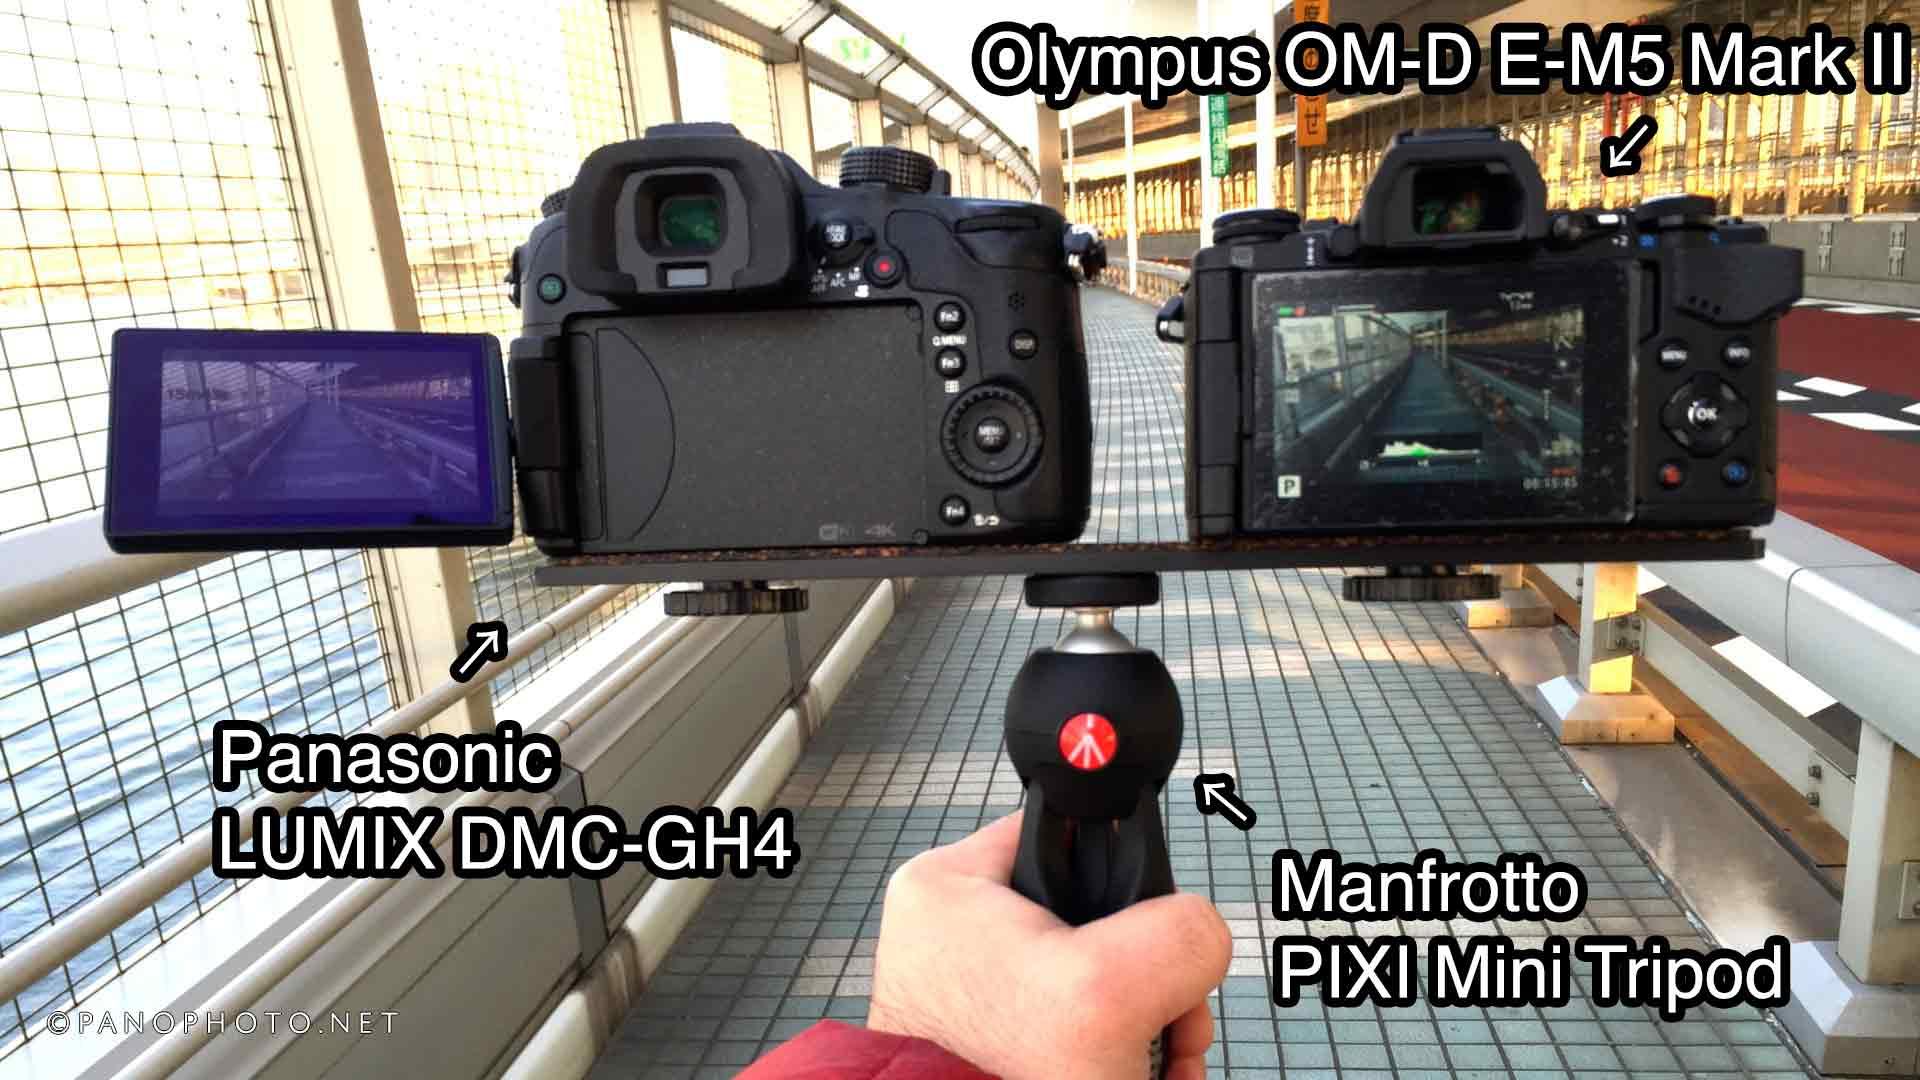 Panasonic-LUMIX-GH4-vs-Olympus-OM-D-E-M5-MK-II-handheld